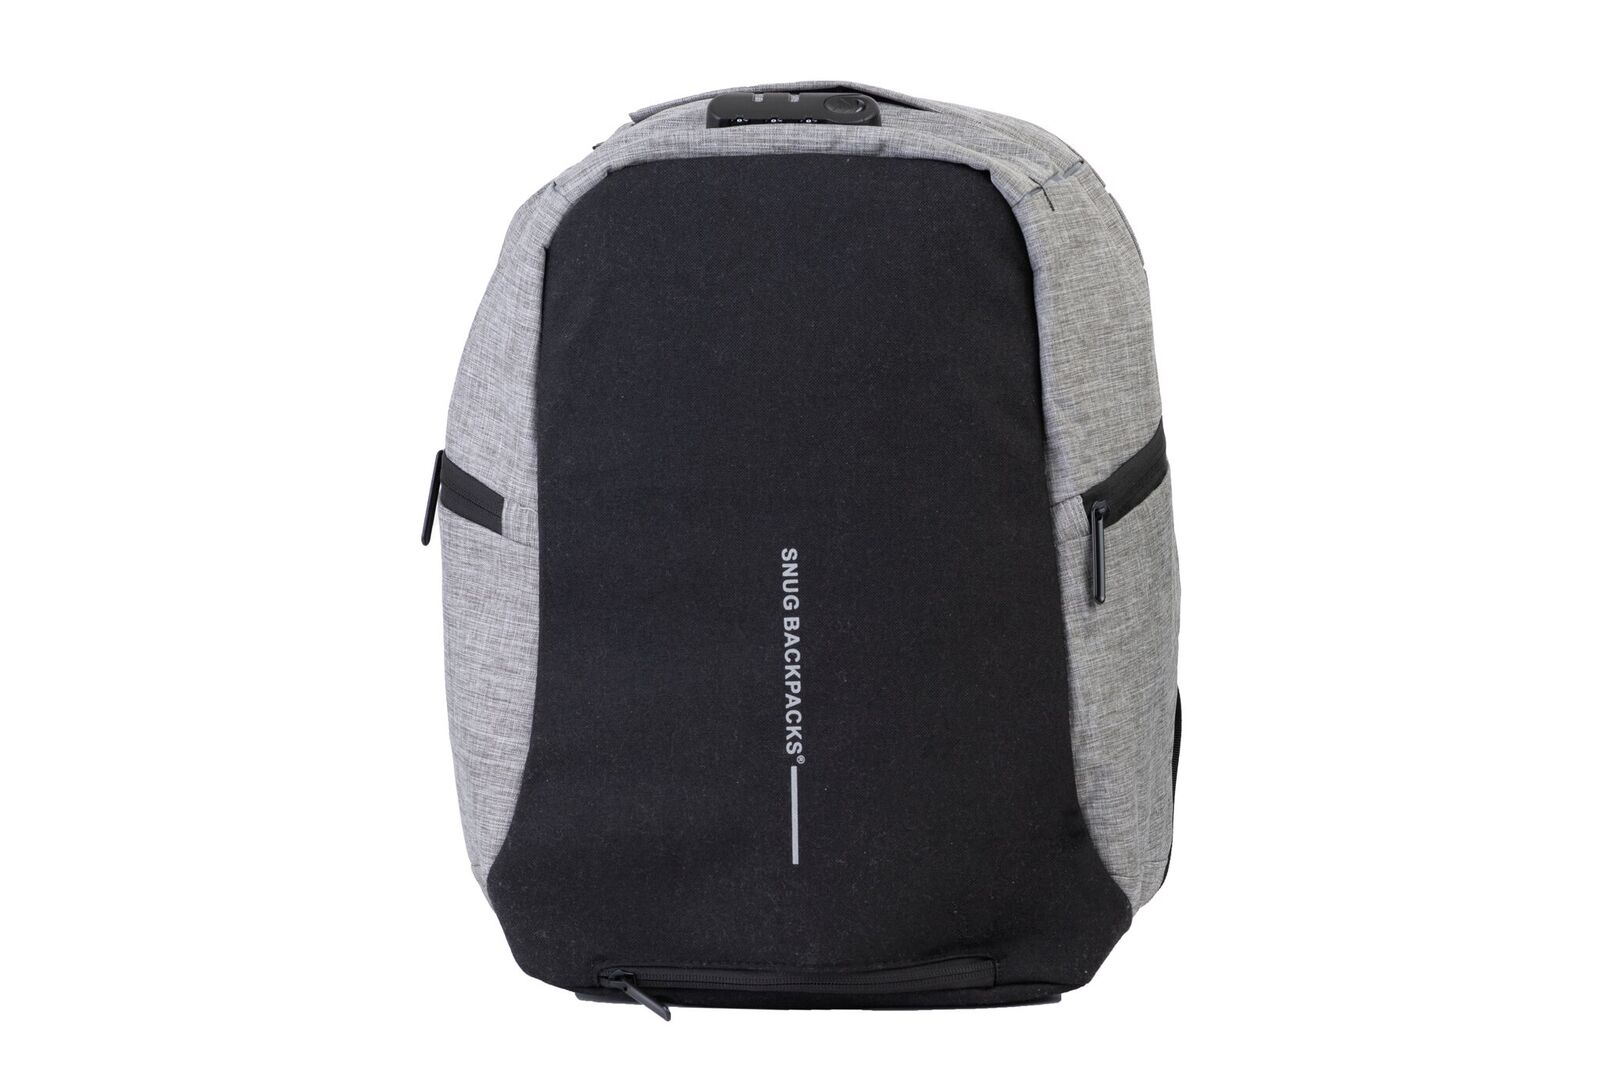 snug anti theft backpack photo